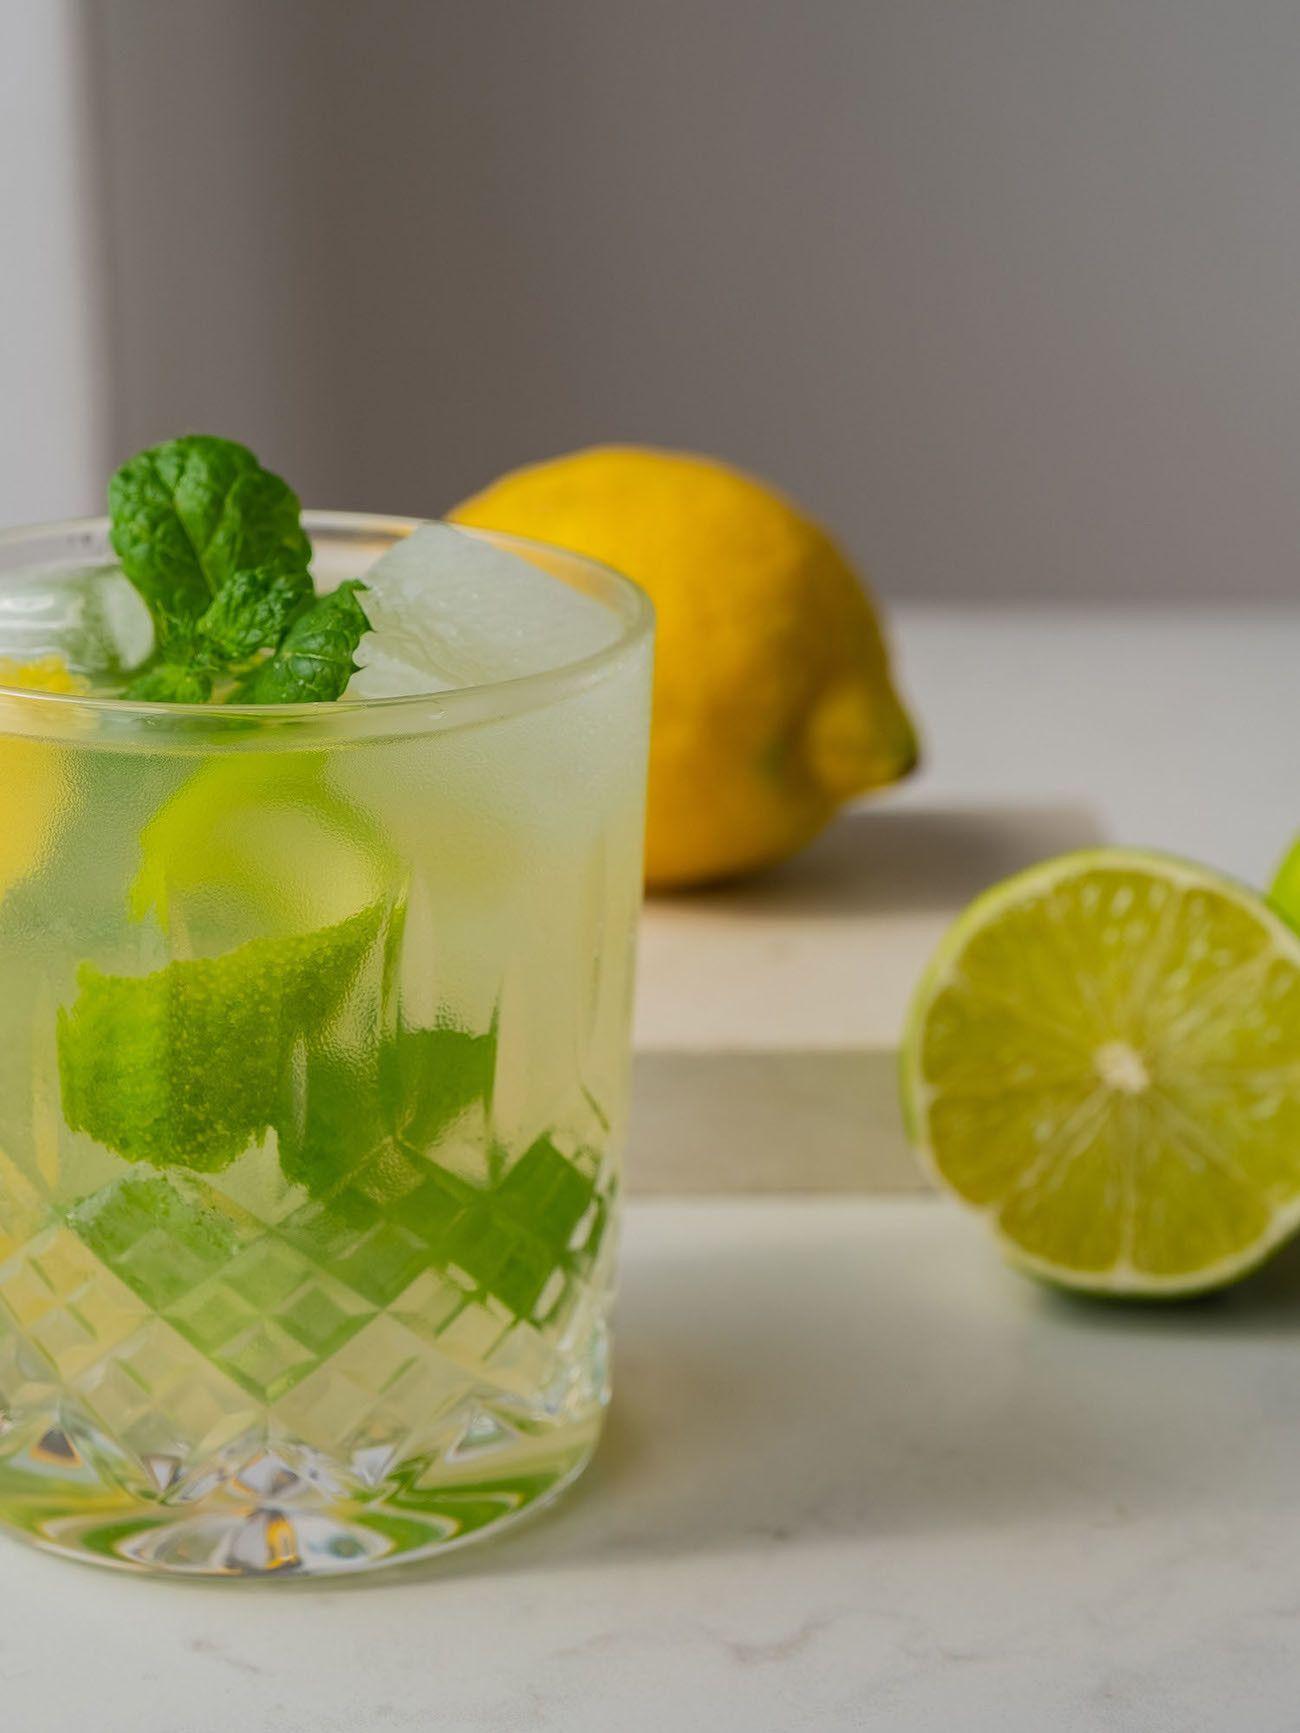 Foodblog About Fuel, Rezept Power Hugo, Saint Germain, Drink, Minze